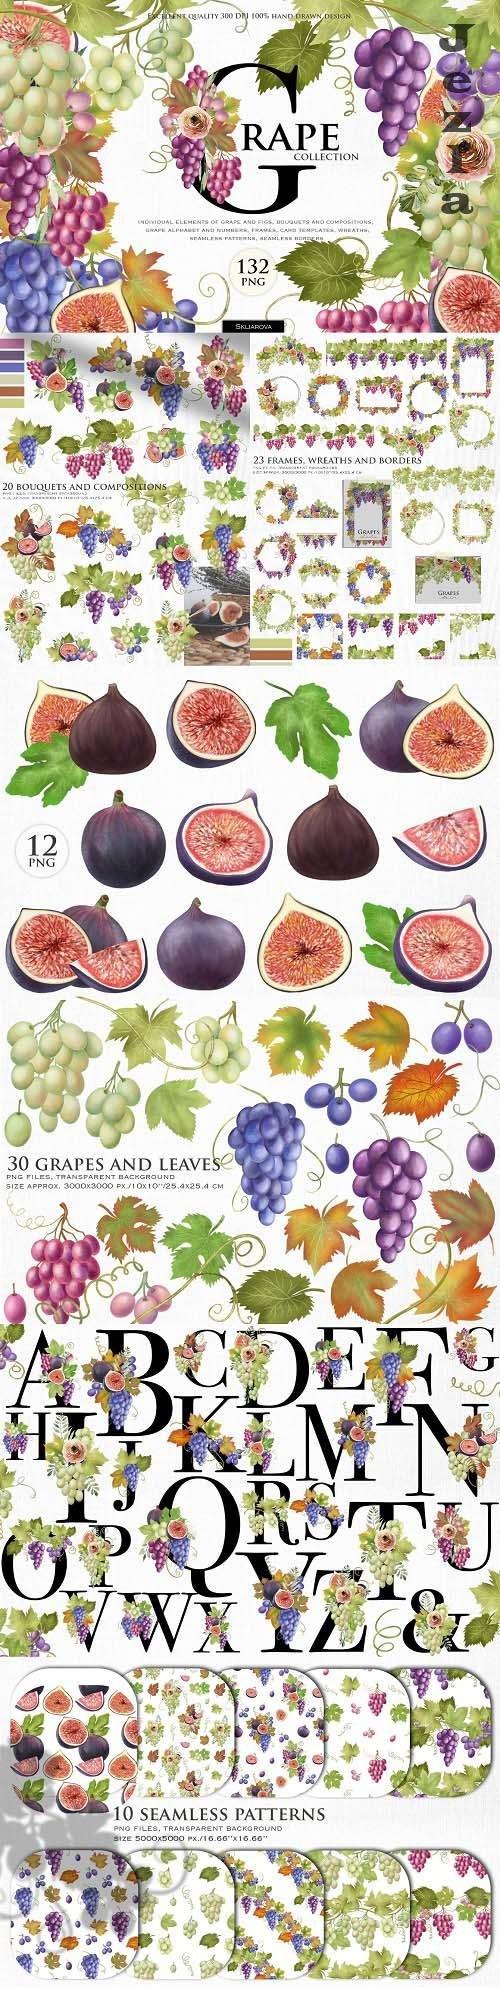 Grape collection - 6260638